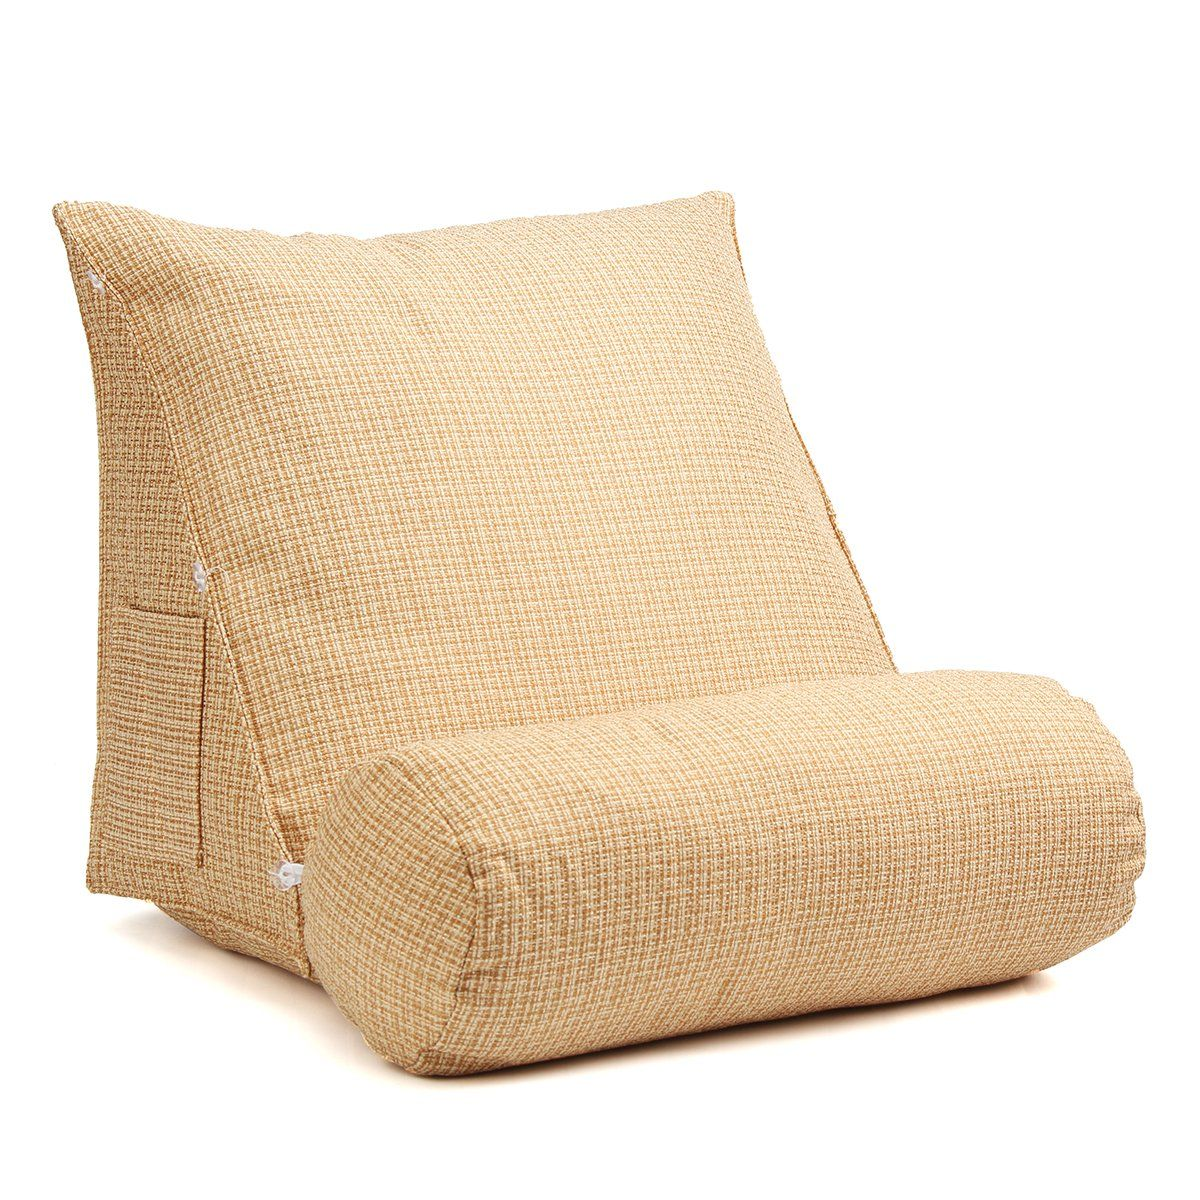 Adjustable back wedge zipper cushion pillow sofa bed